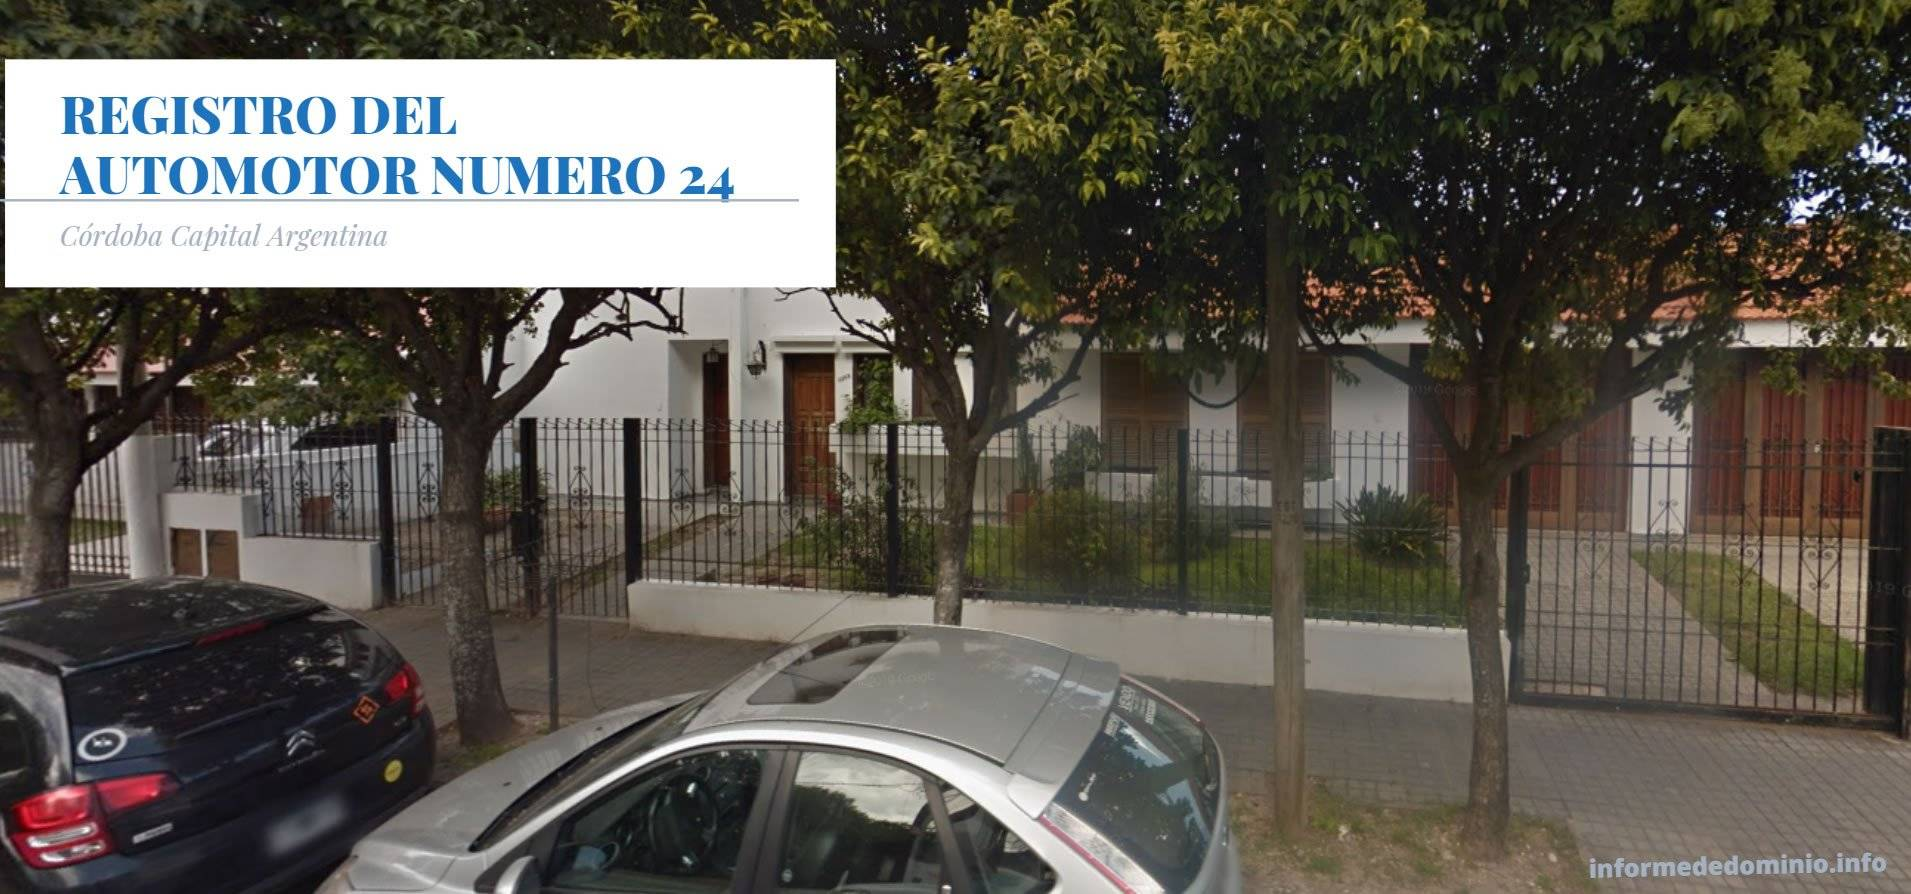 Registro Automotor Número 24 de Cordoba Capital